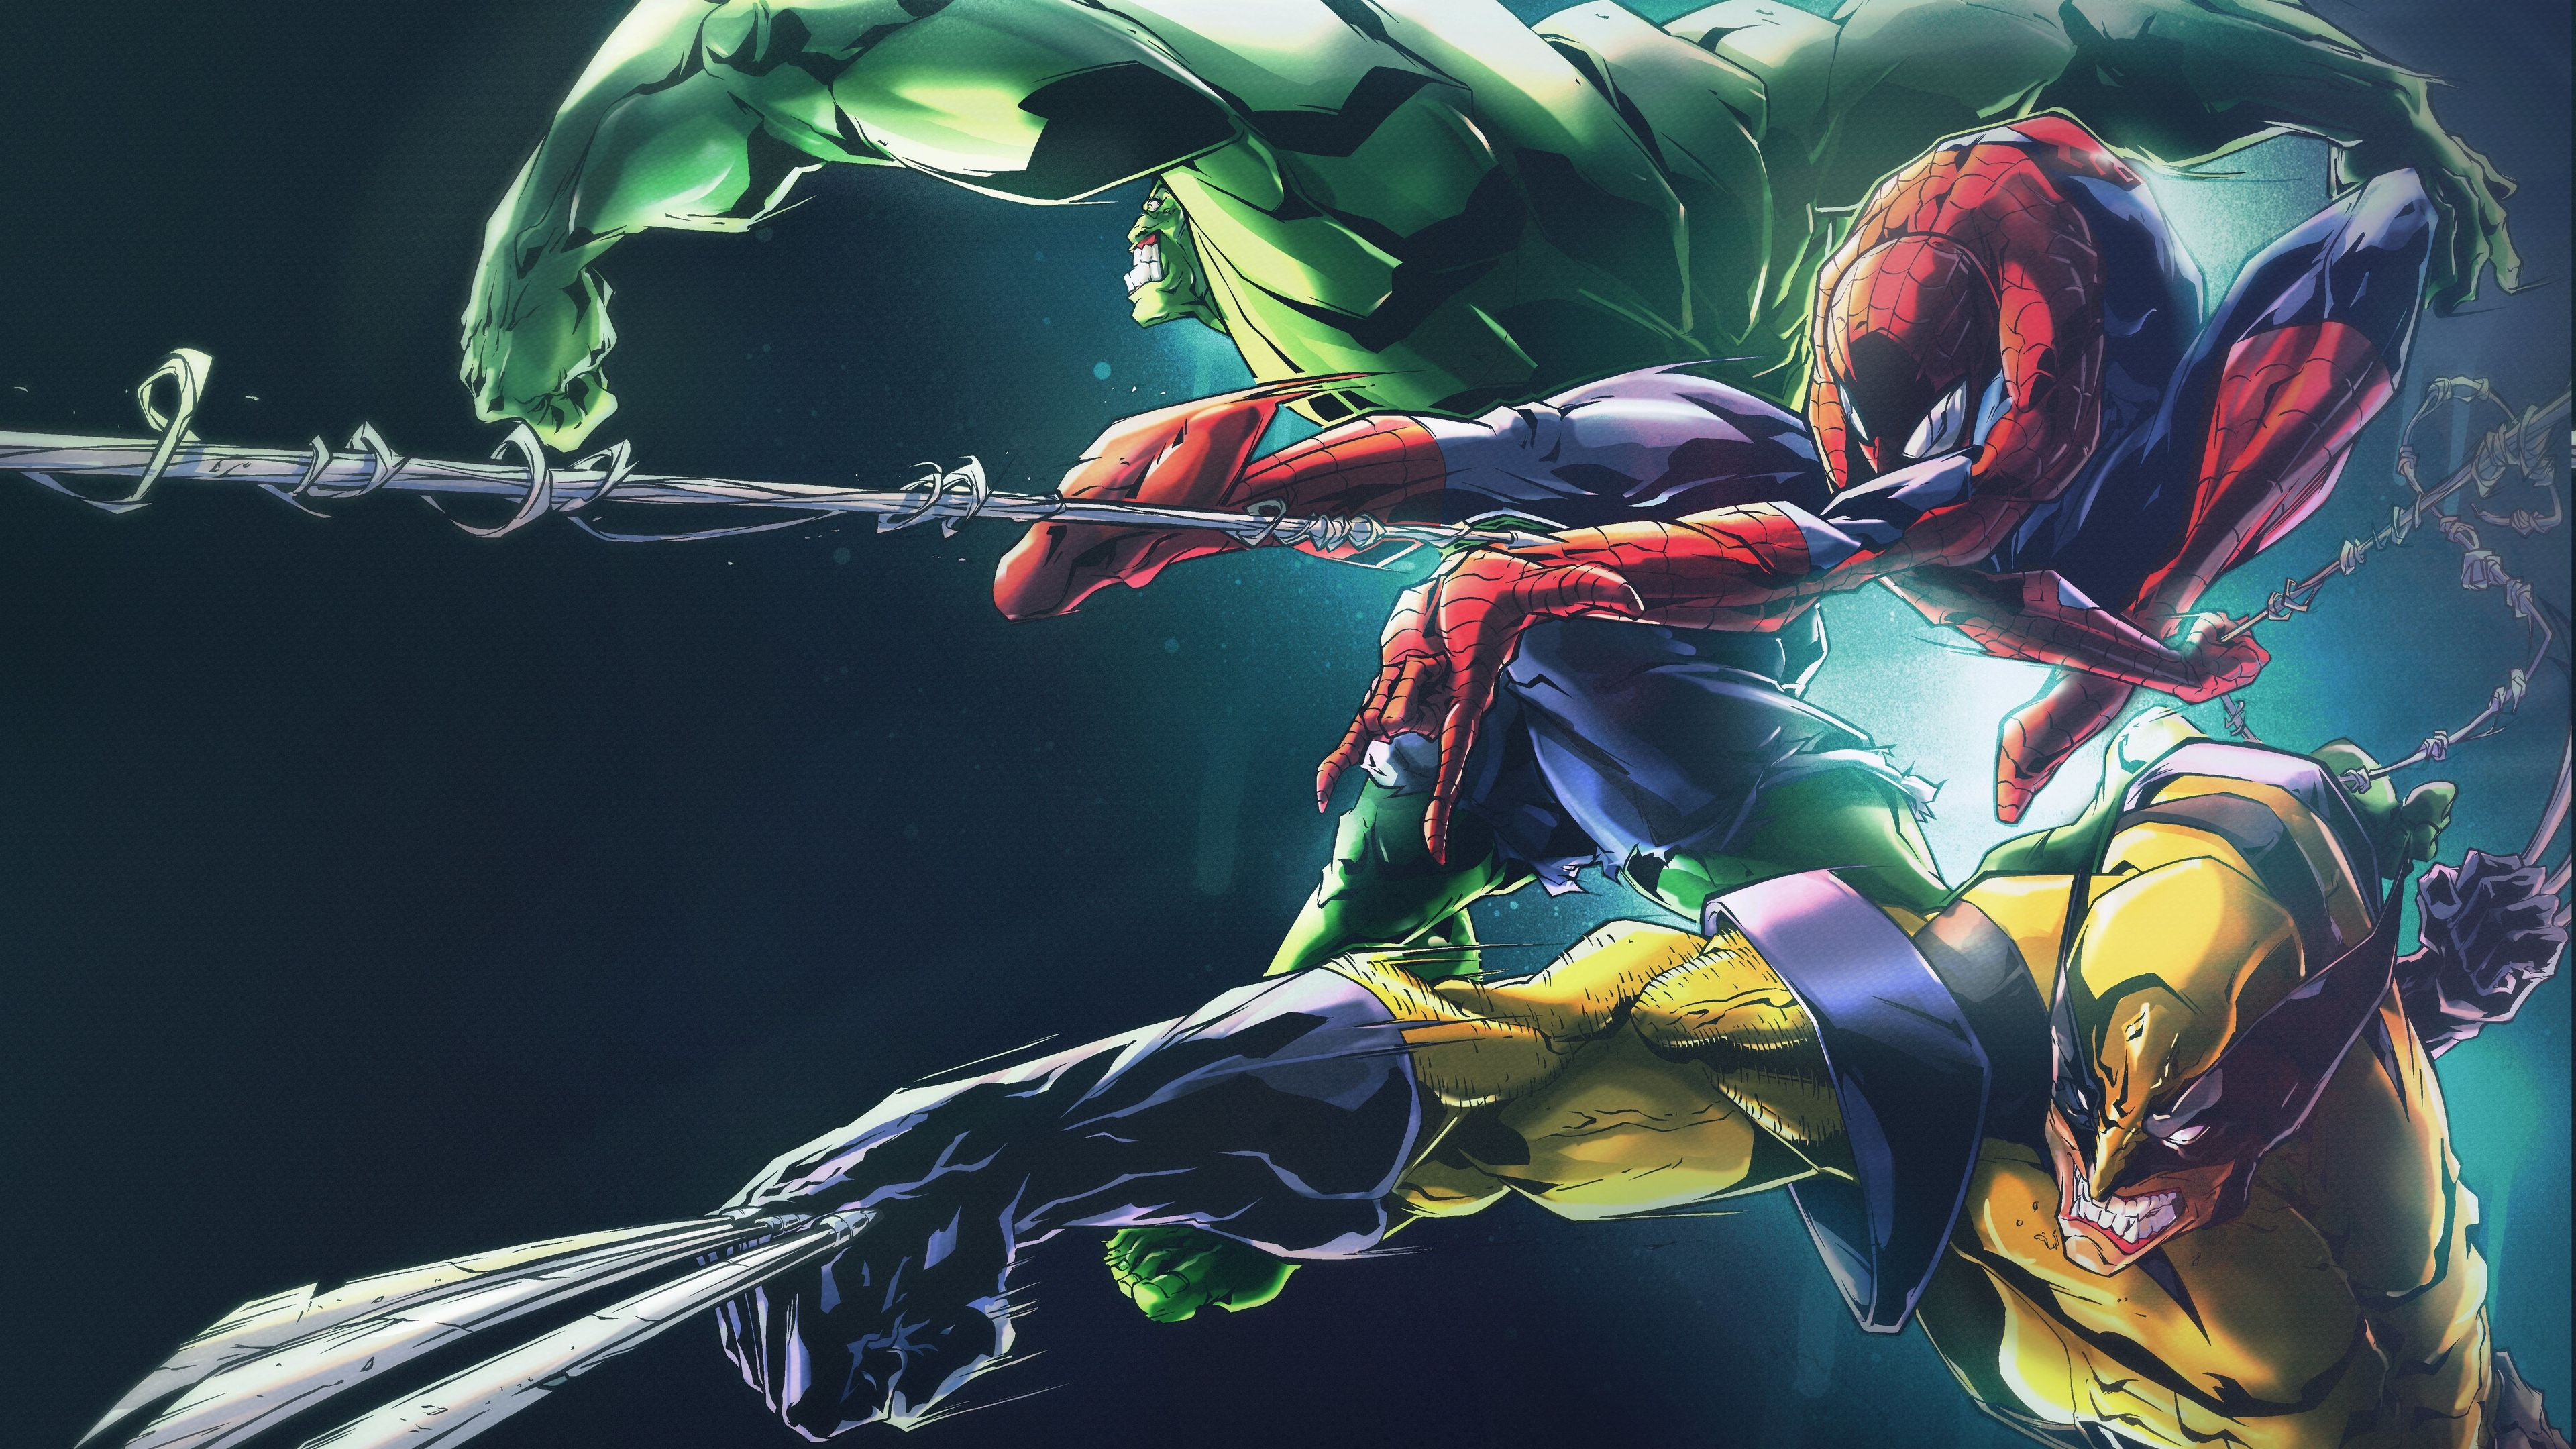 Wallpaper 4k Hulk Spider Man Wolverine 8k 4k Wallpapers 5k